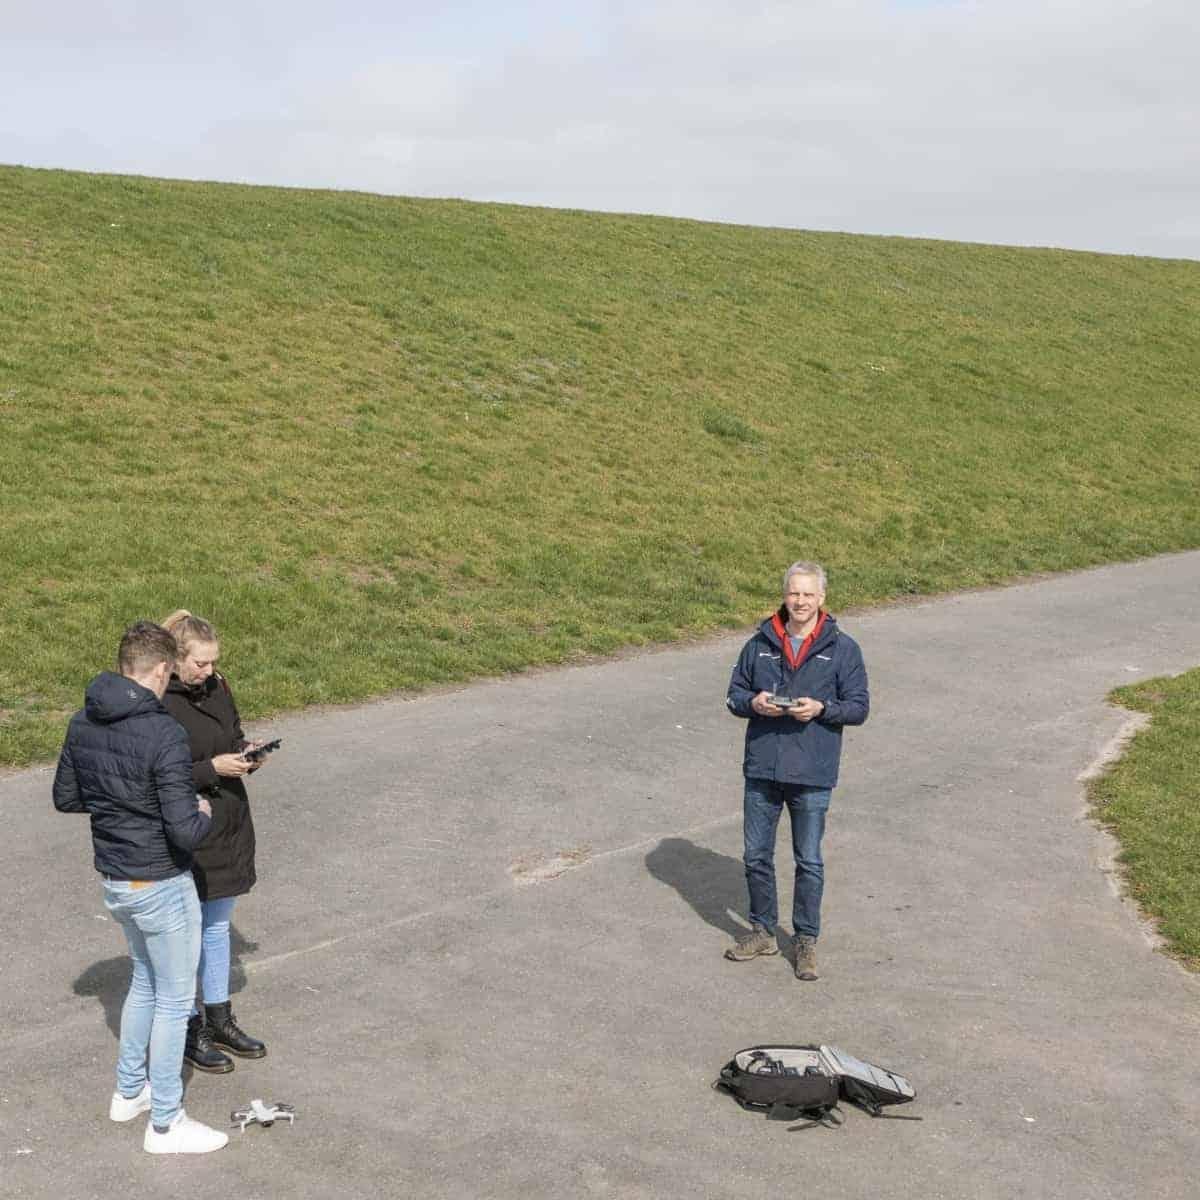 Fotografie cursus dronefotografie